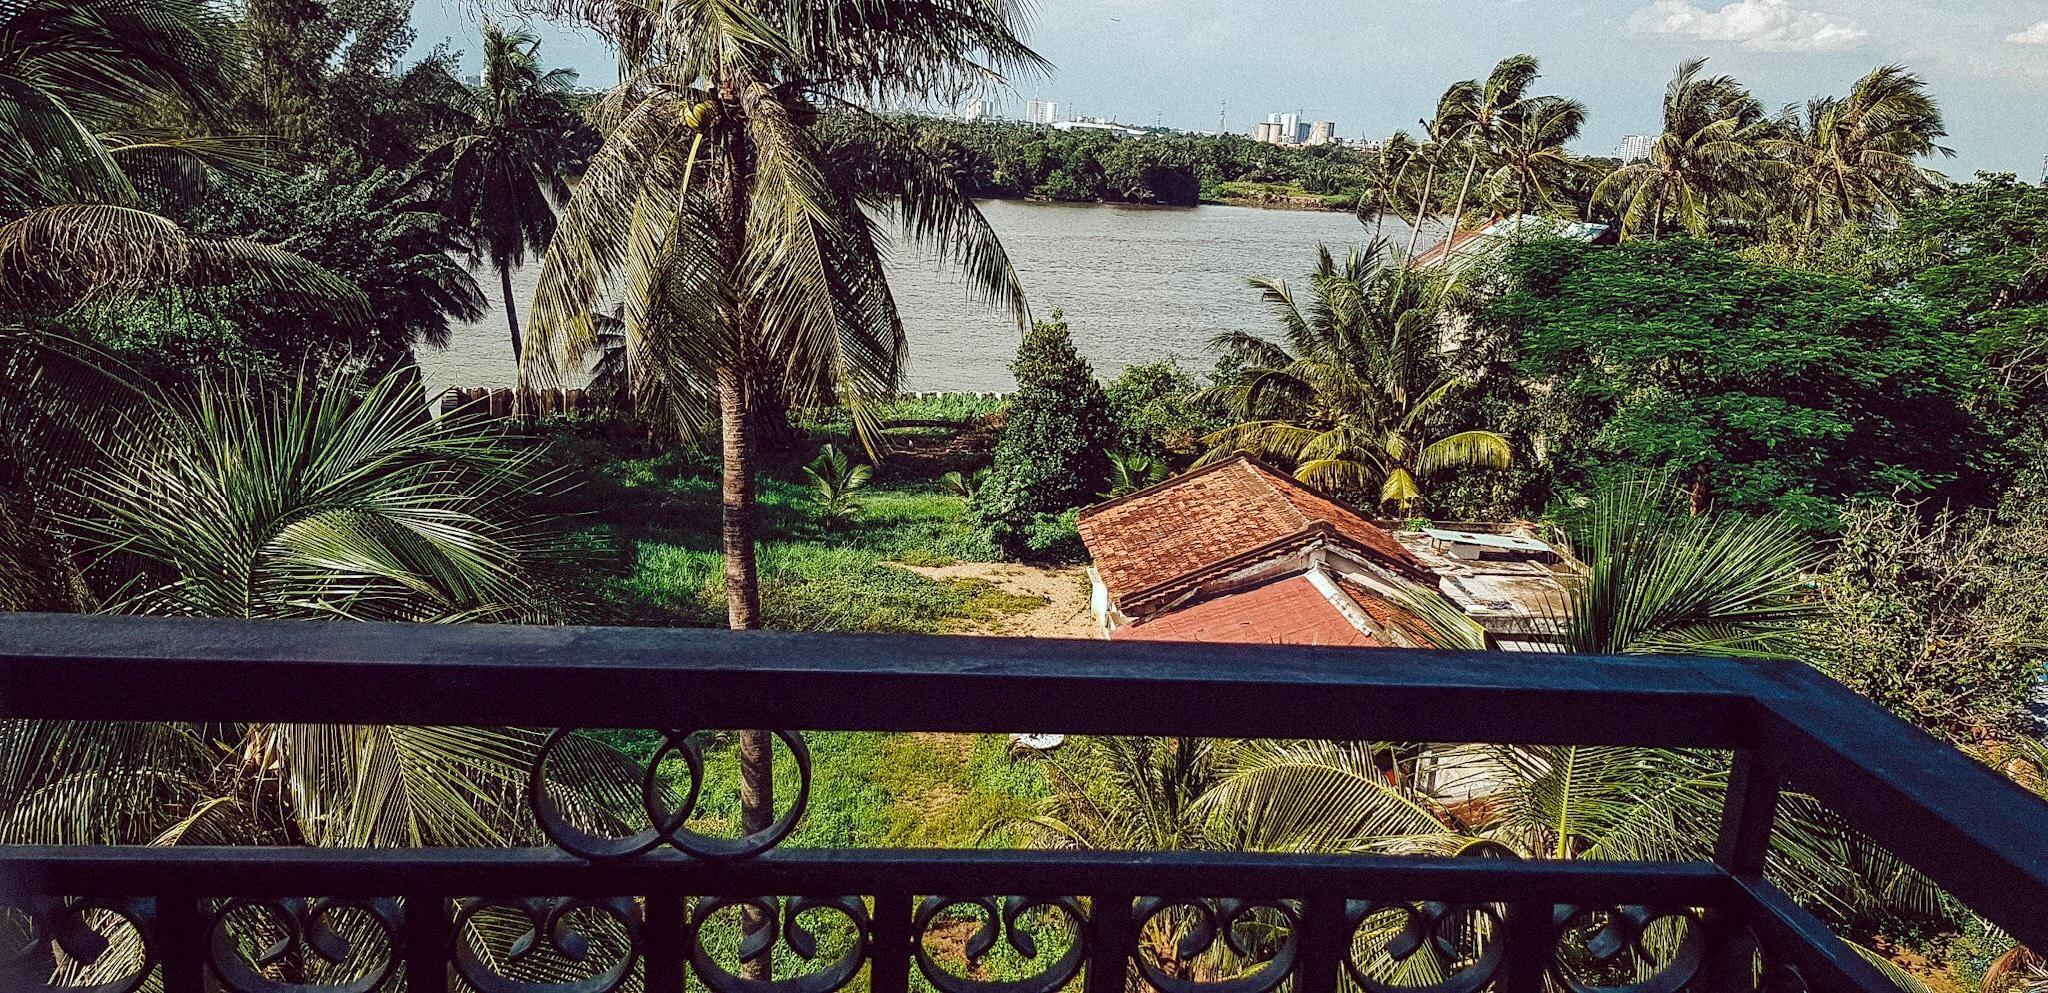 Melia River View